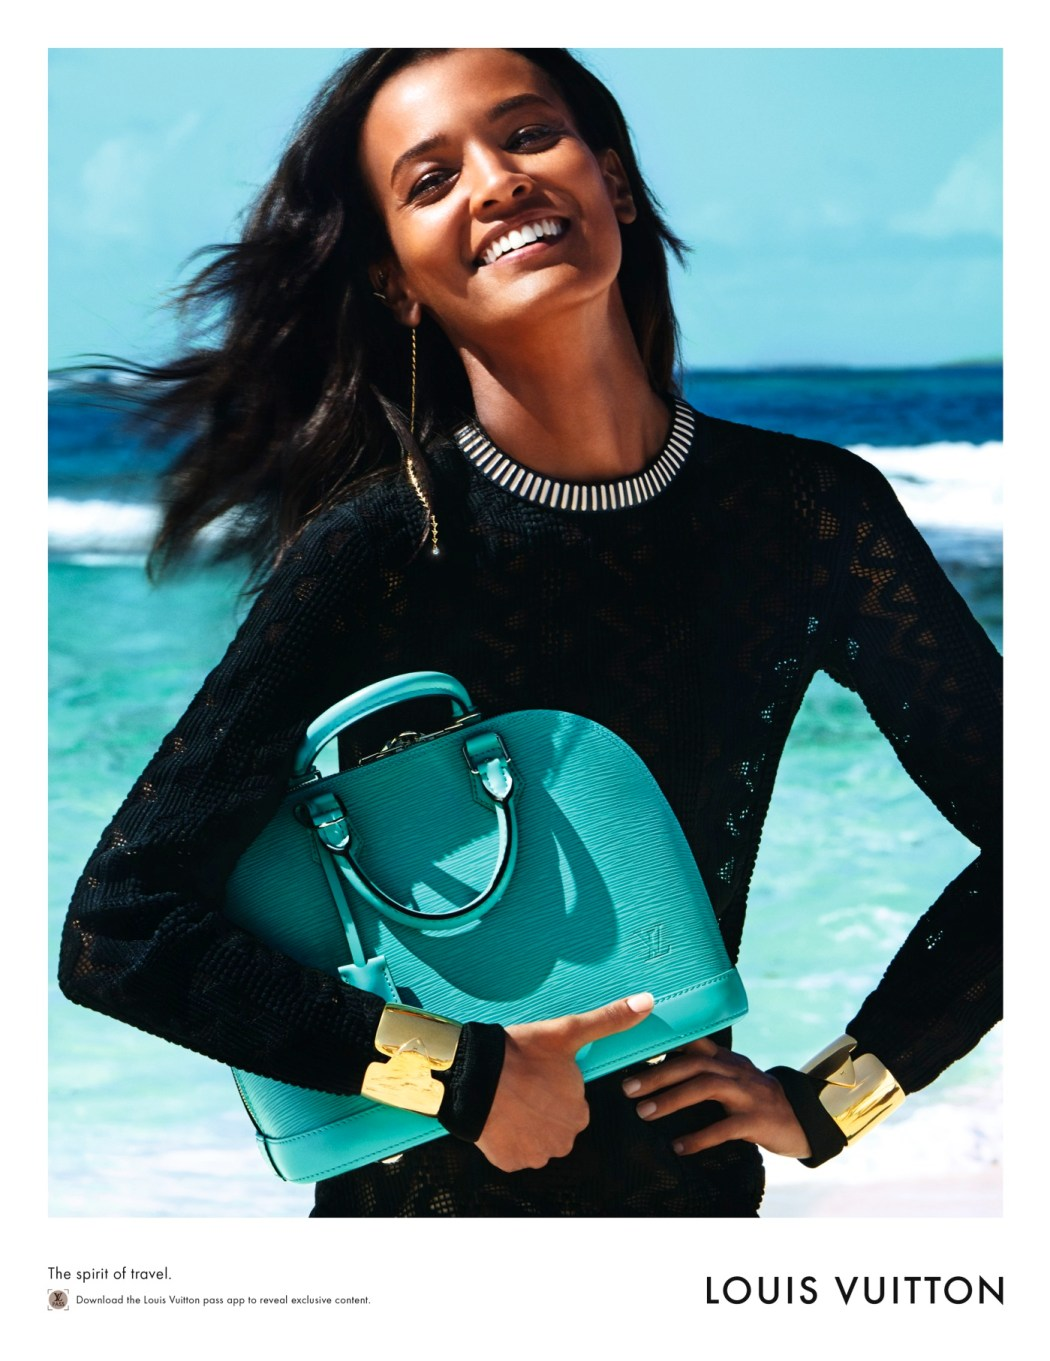 Louis Vuitton Spirit of Travel Ad Campaign by Patrick Demarchelier 1